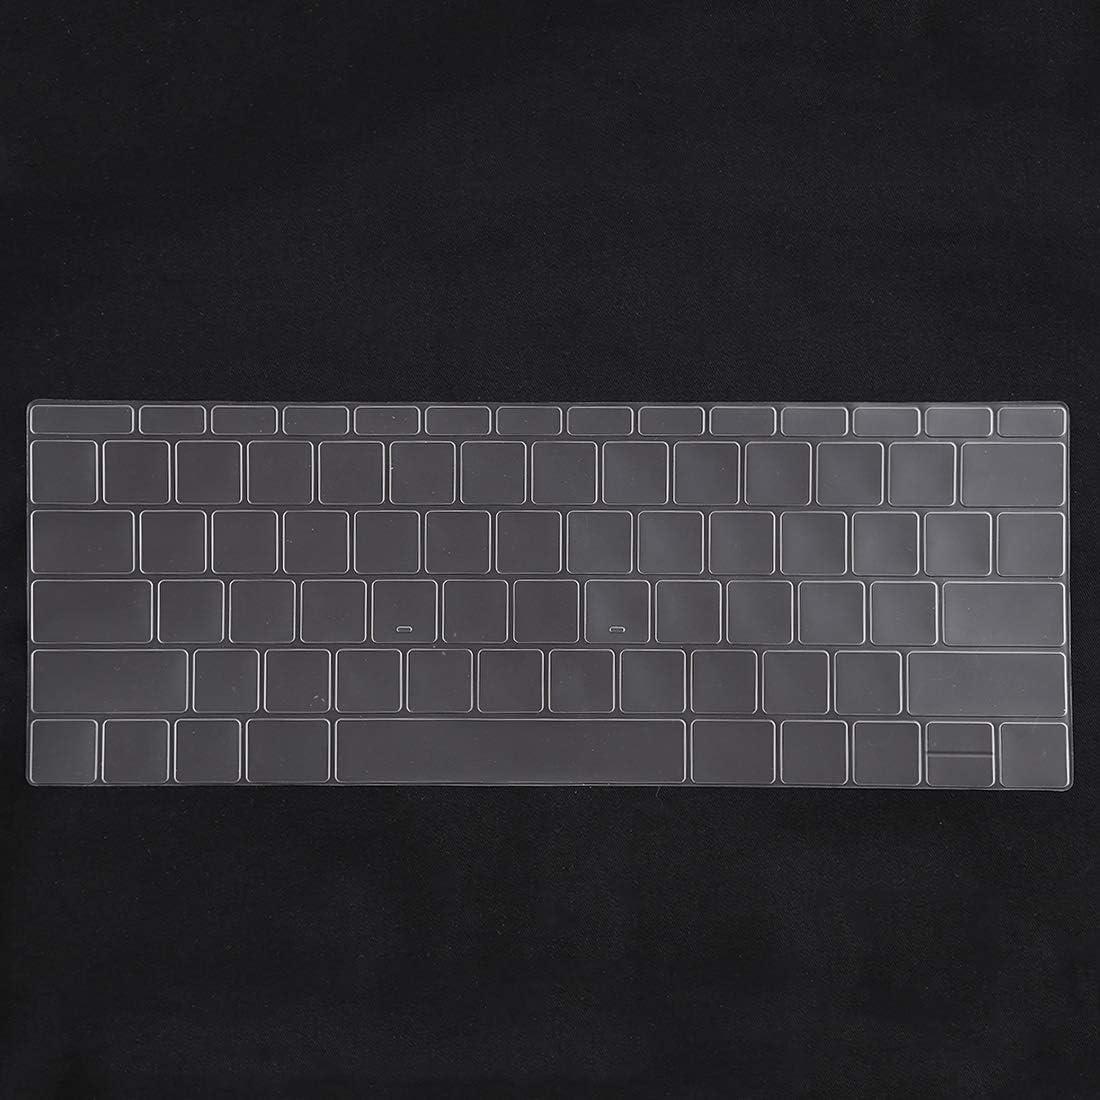 Color : Black A1534 // A1708 Black CellphoneMall Protectors Keyboard Protector Silica Gel Film for MacBook Retina 12 // Pro 13